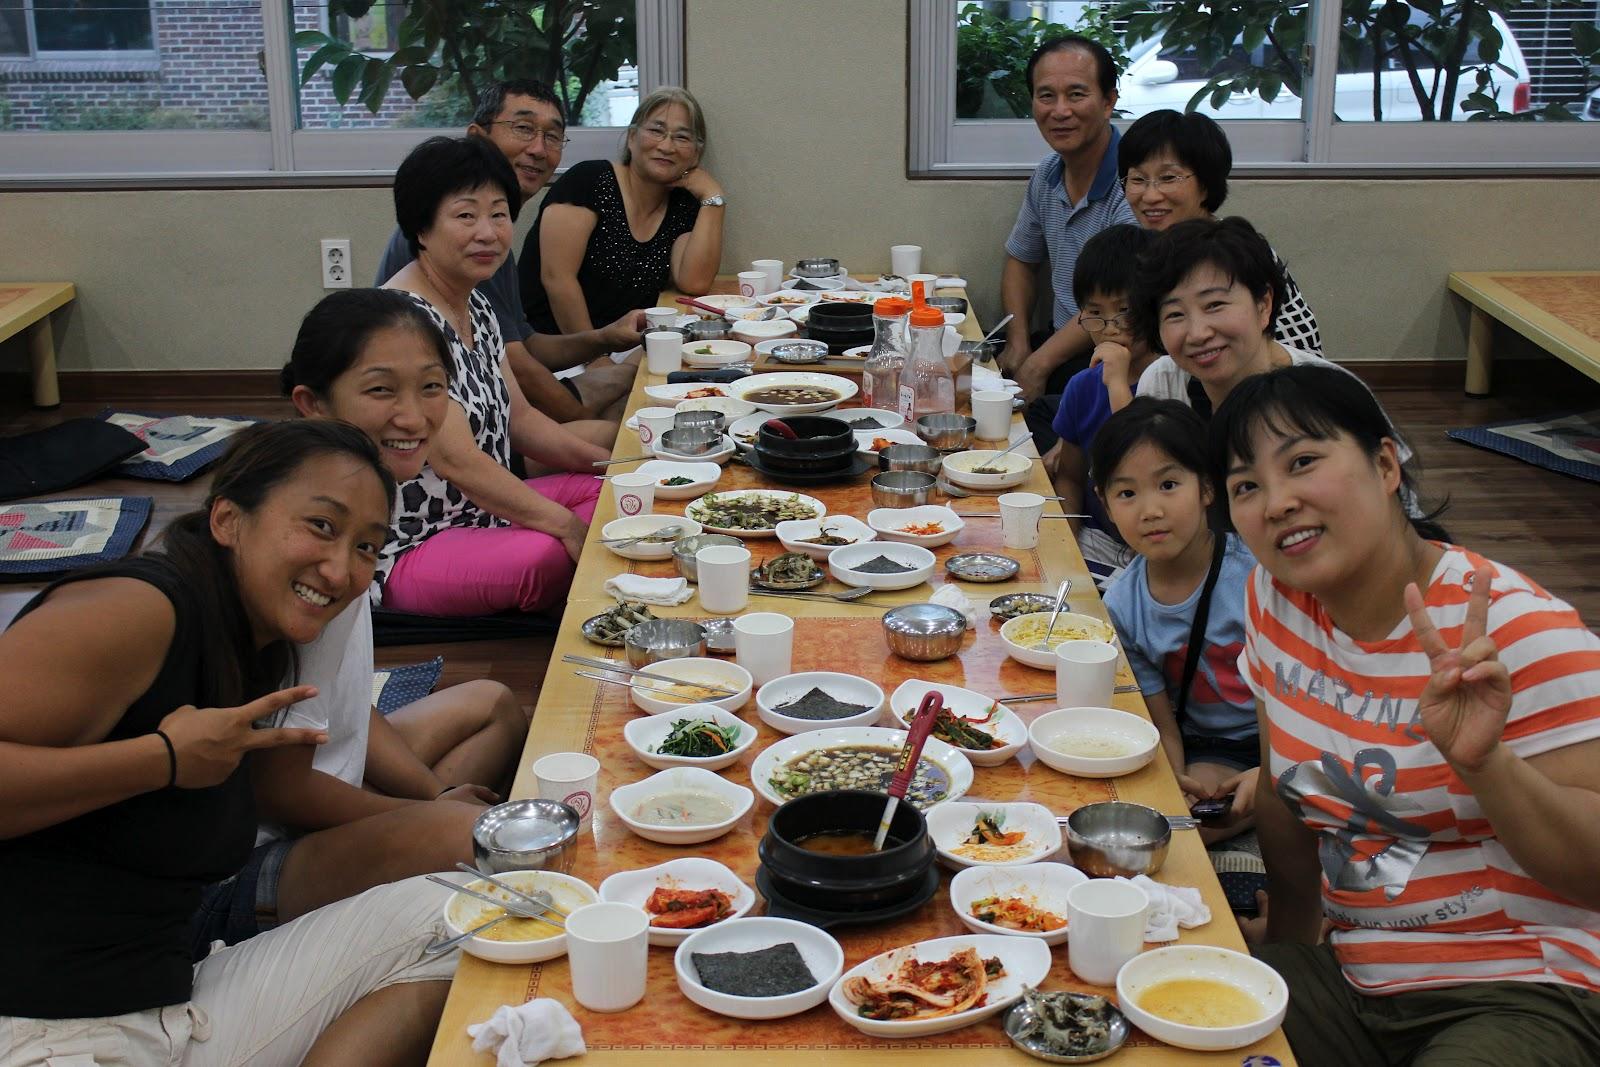 StellaBella: Wednesday Food: Travel to S. Korea Part 1